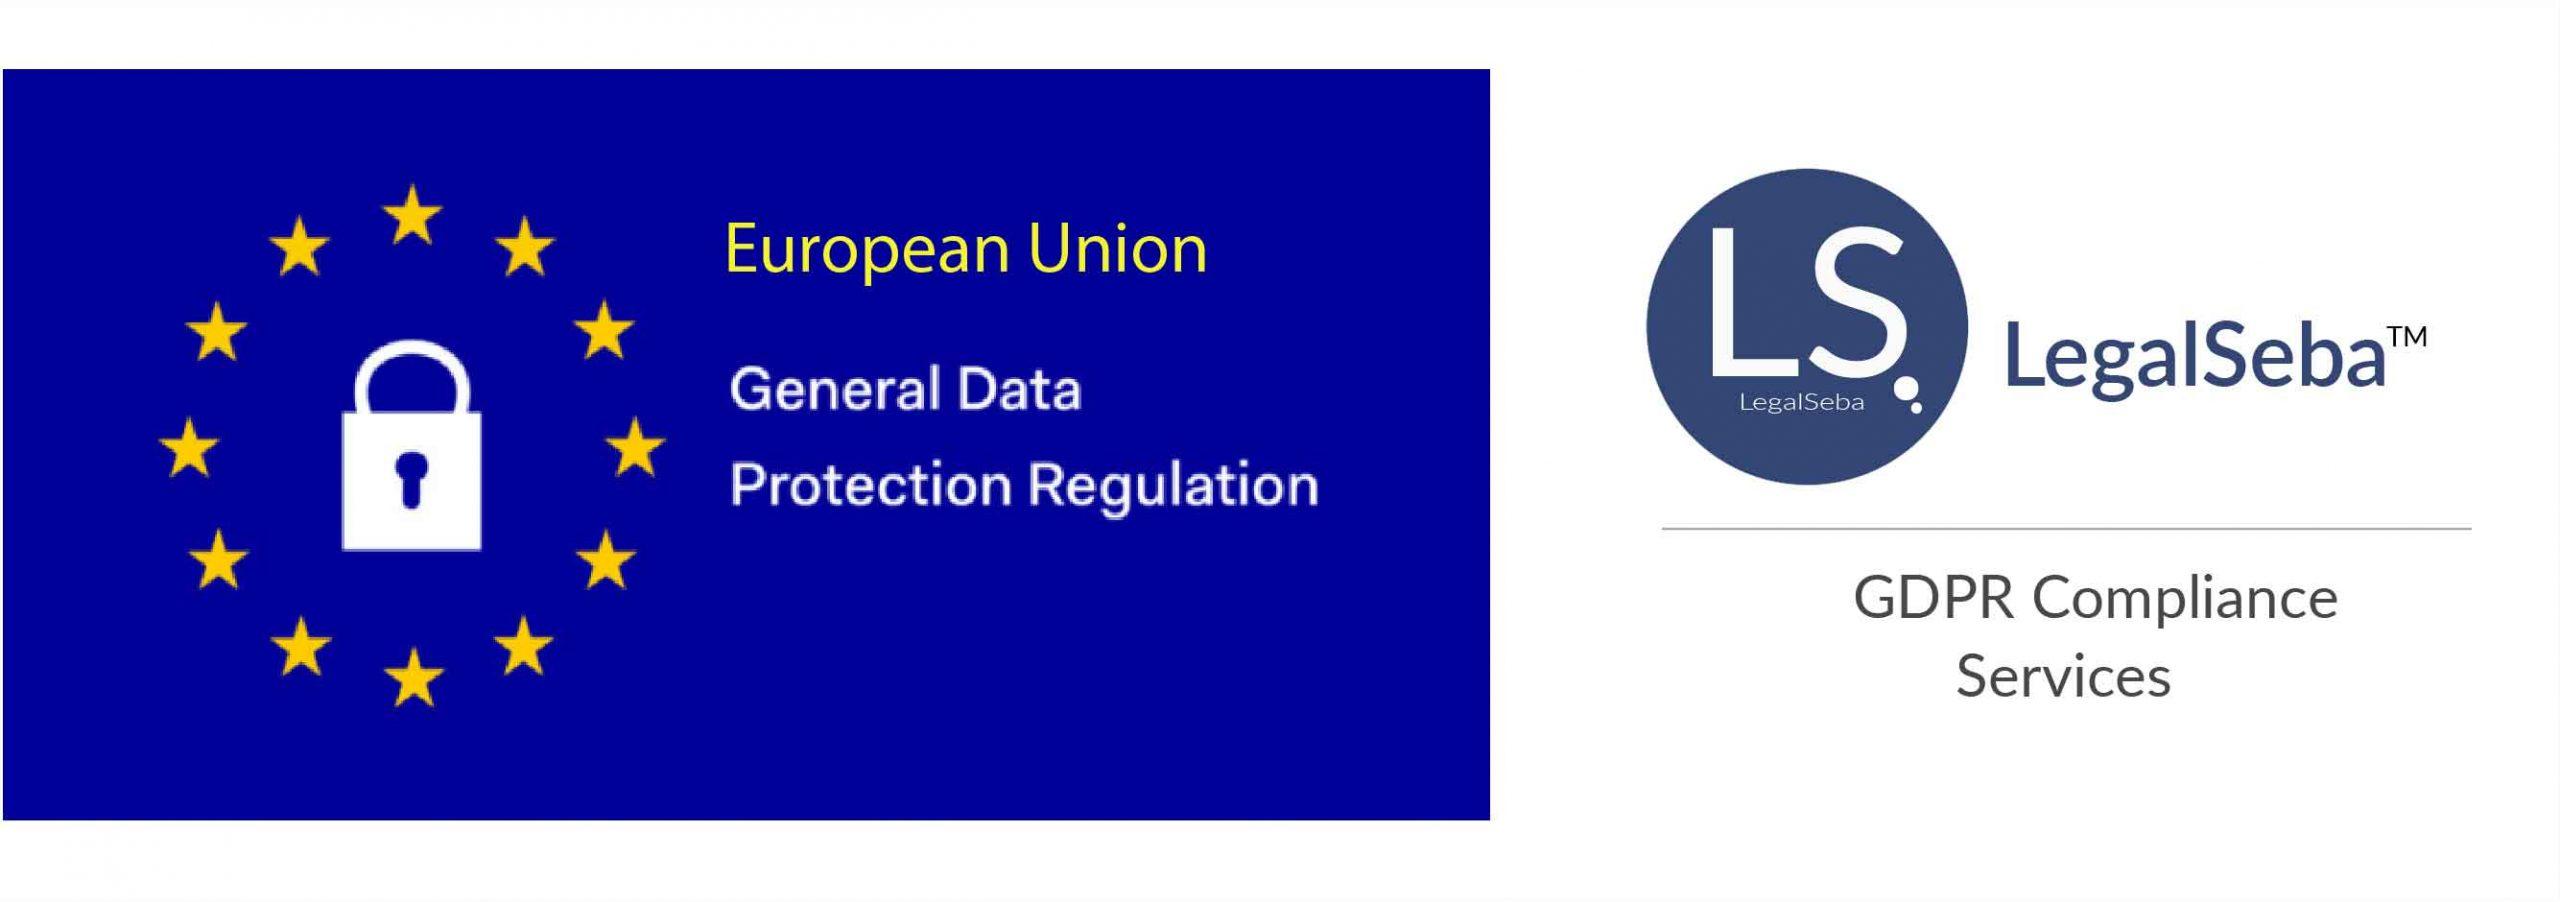 GDPR Compliance Services LegalSeba